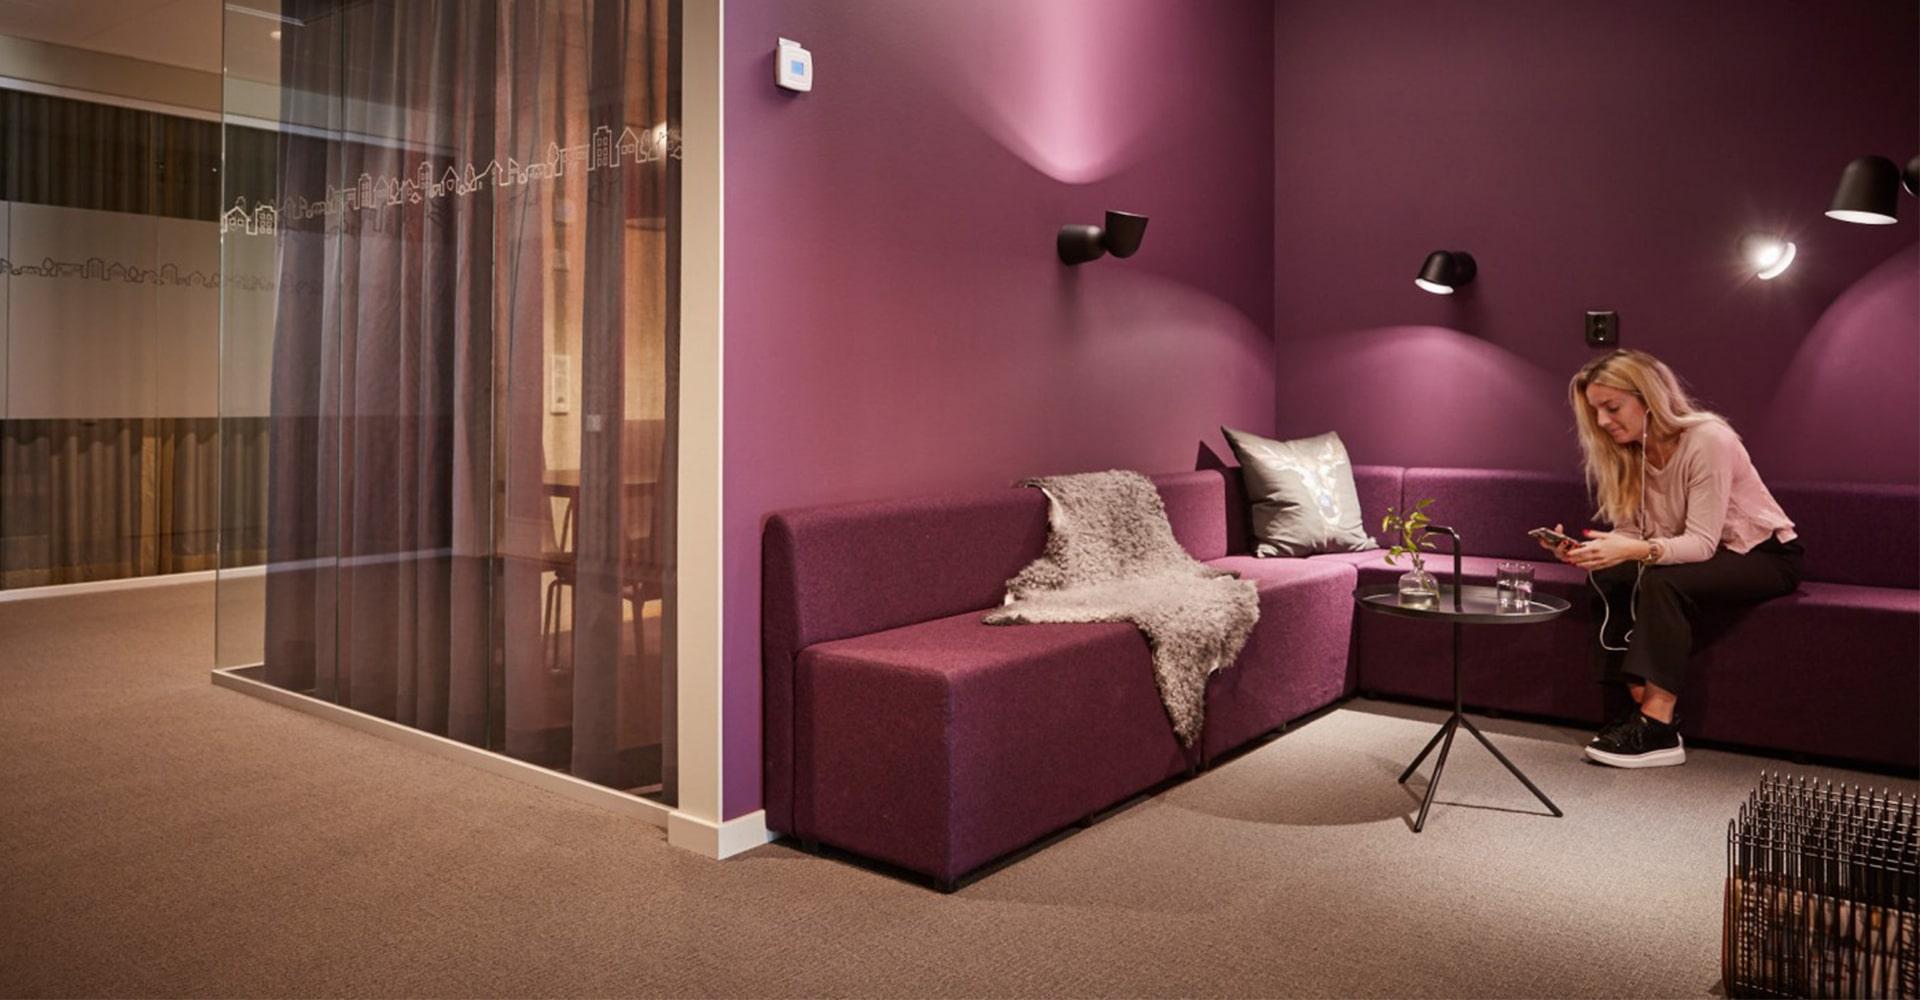 Lila lounge-område på HSB Göta:s kontor